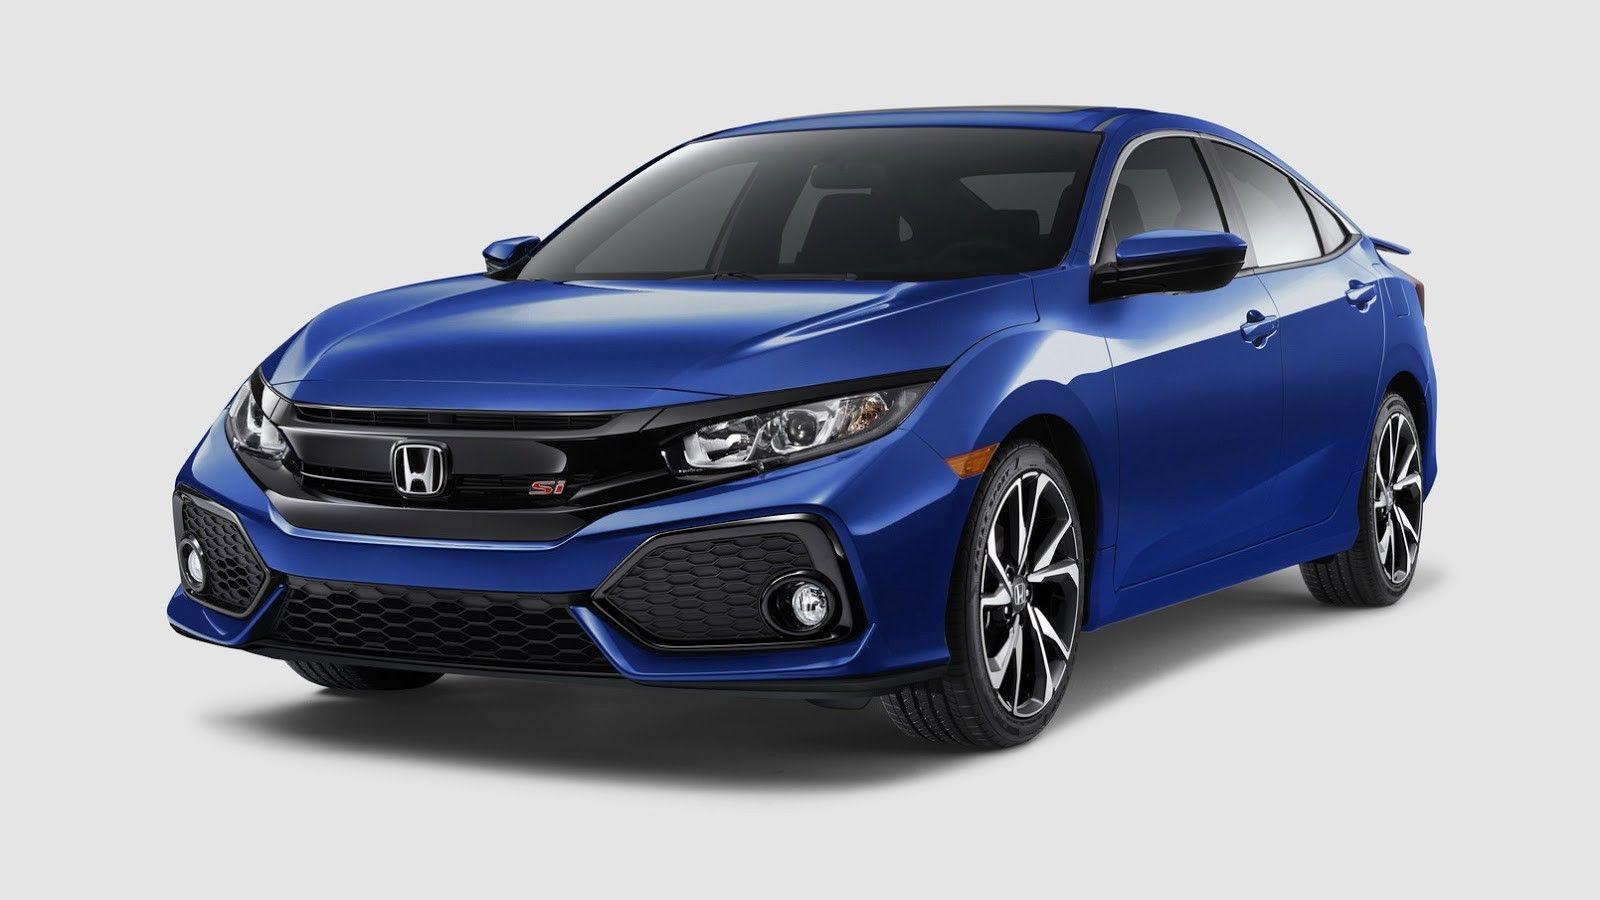 Foto de Honda Civic Si 2018 (2/11) Honda civic si, Honda